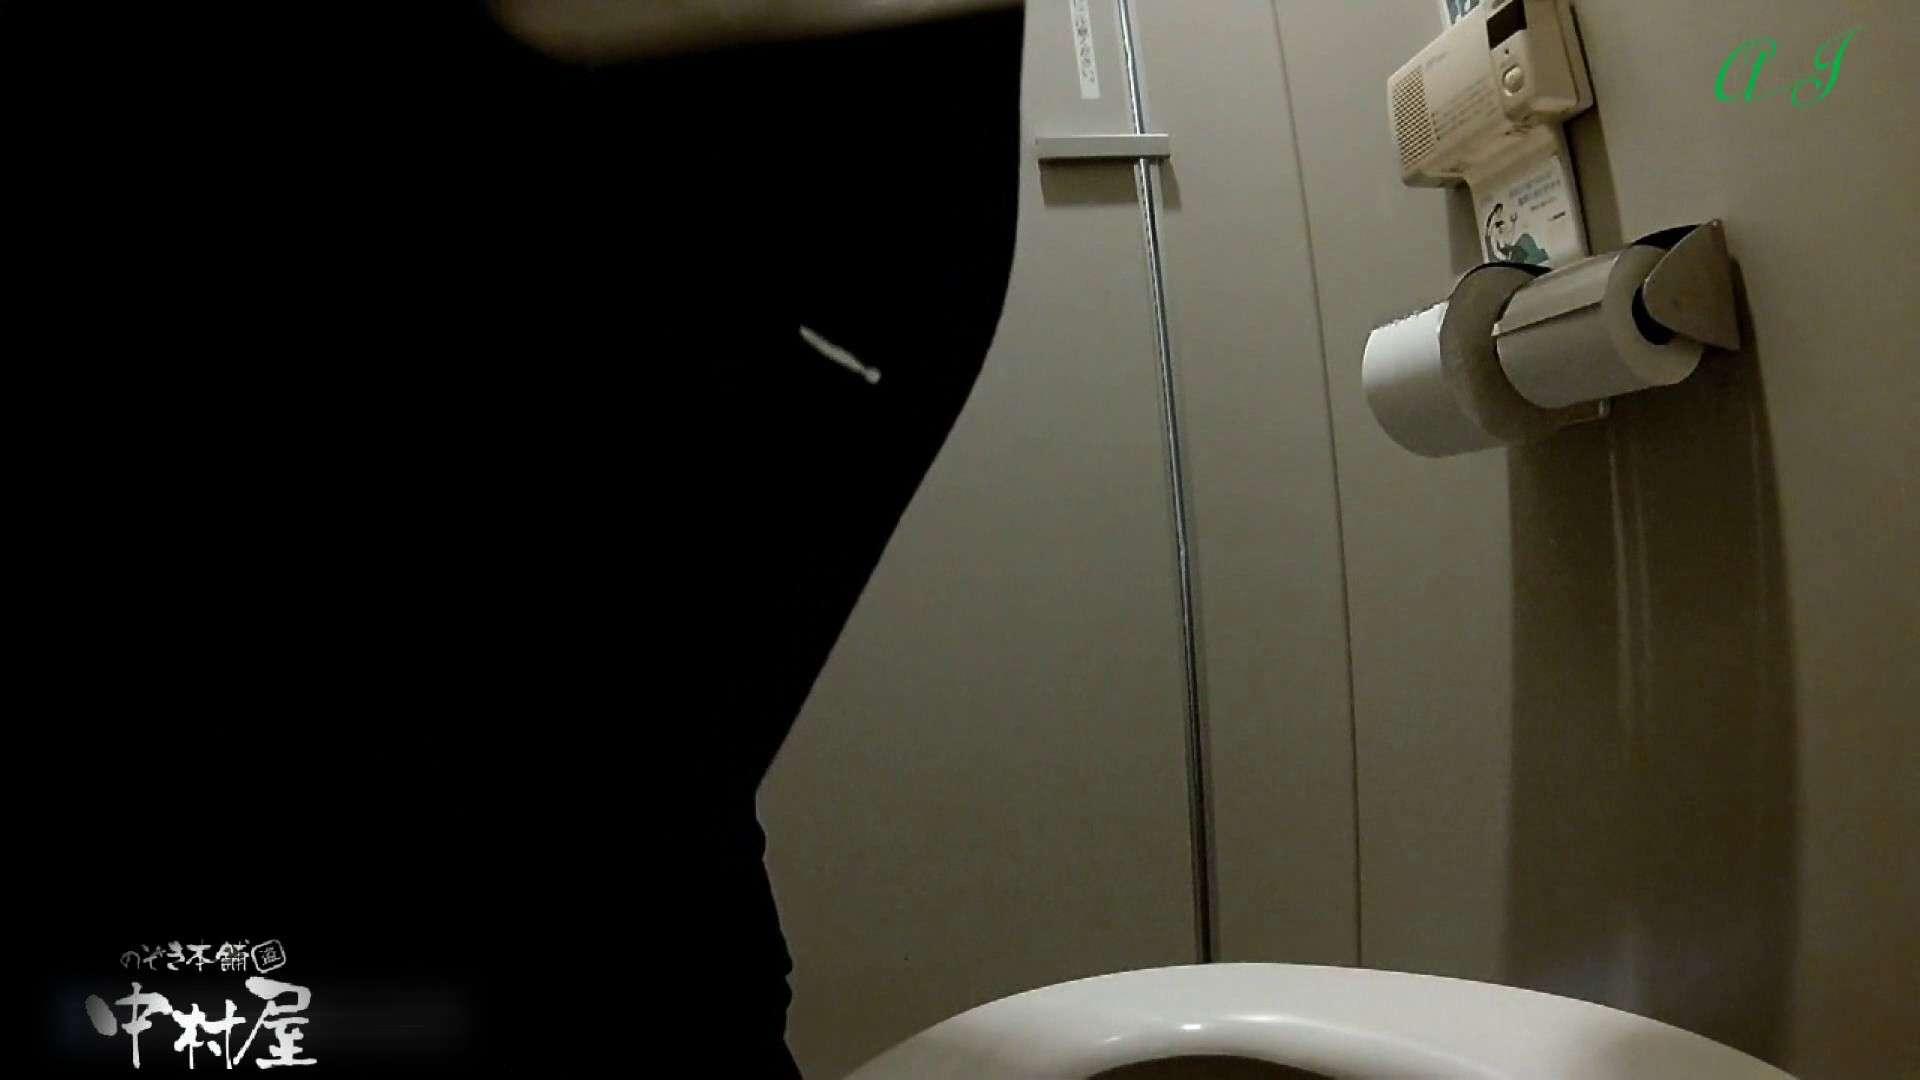 有名大学女性洗面所 vol.83 後編 OLセックス 盗撮エロ画像 71画像 62